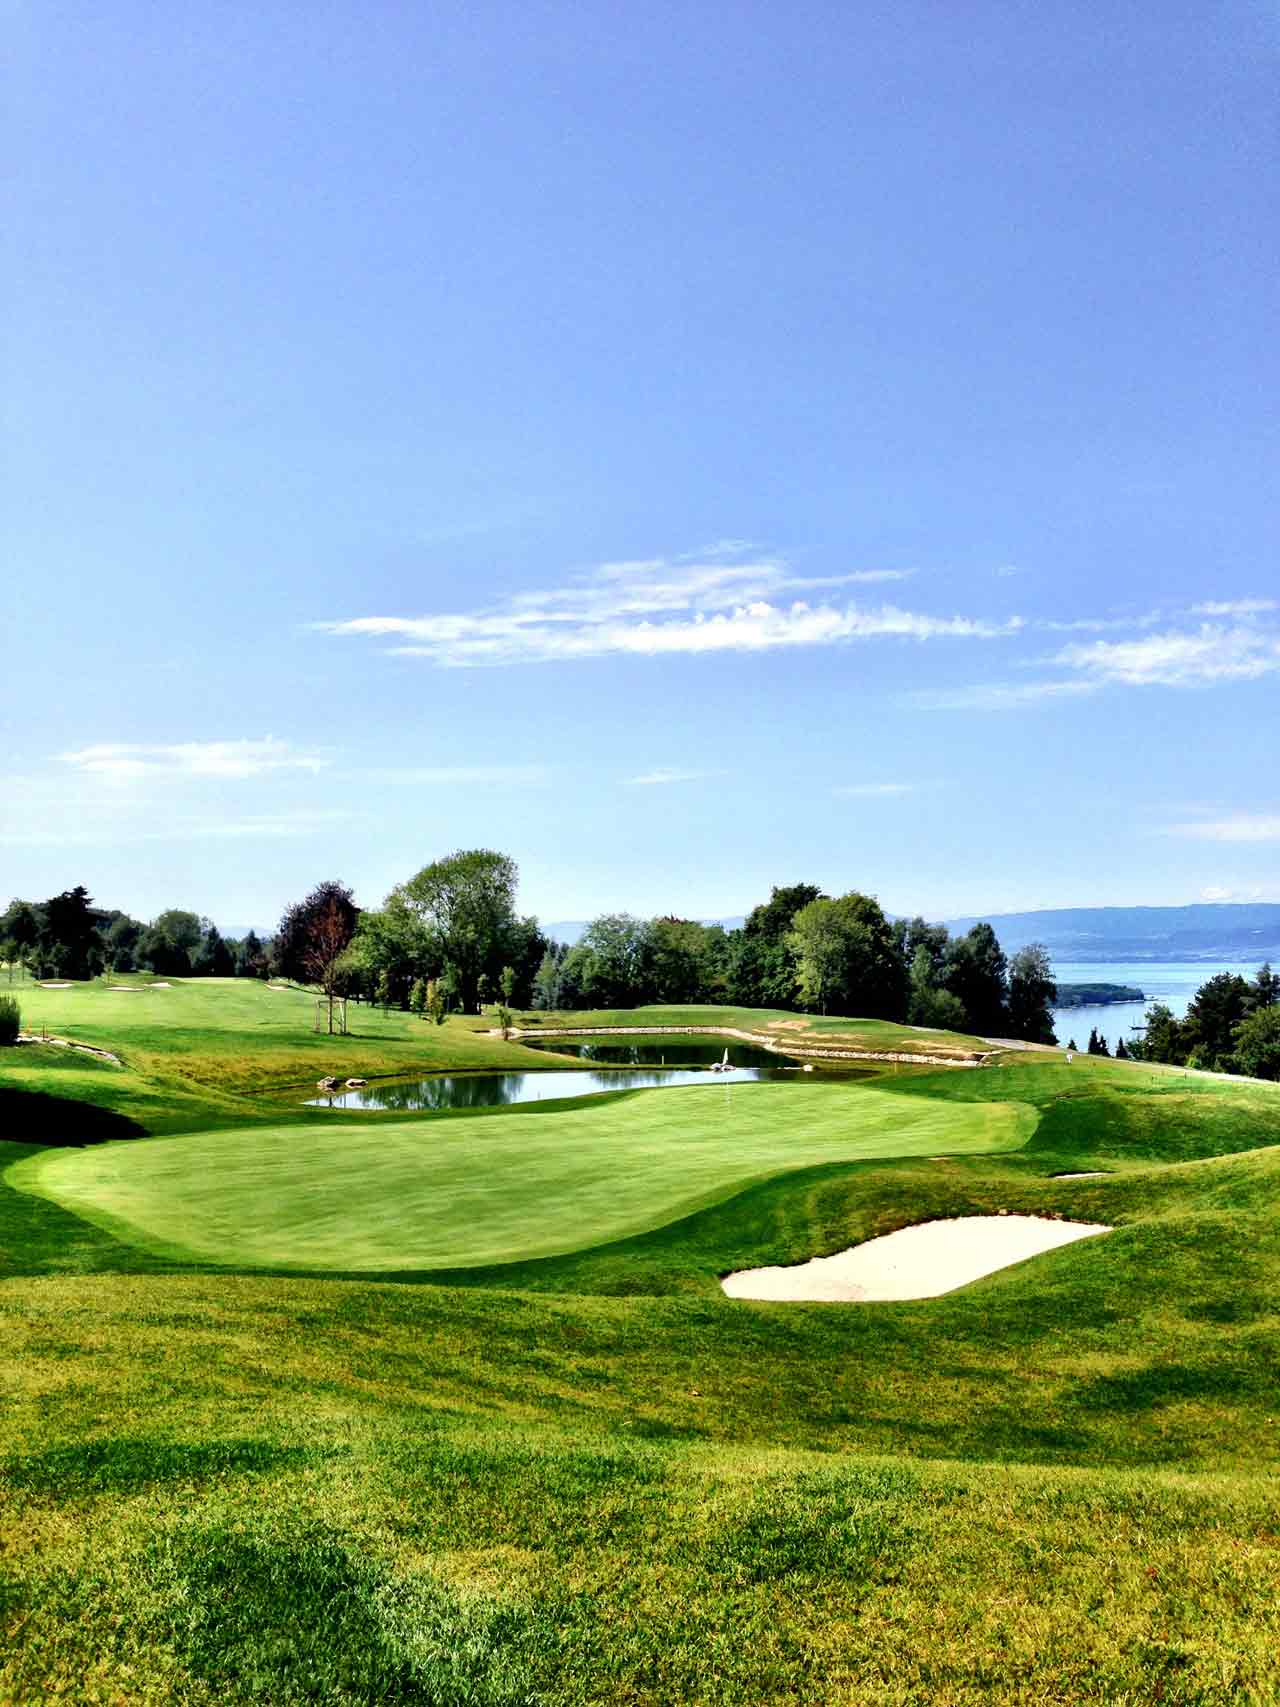 Évian resort golf club, Haute-Savoie